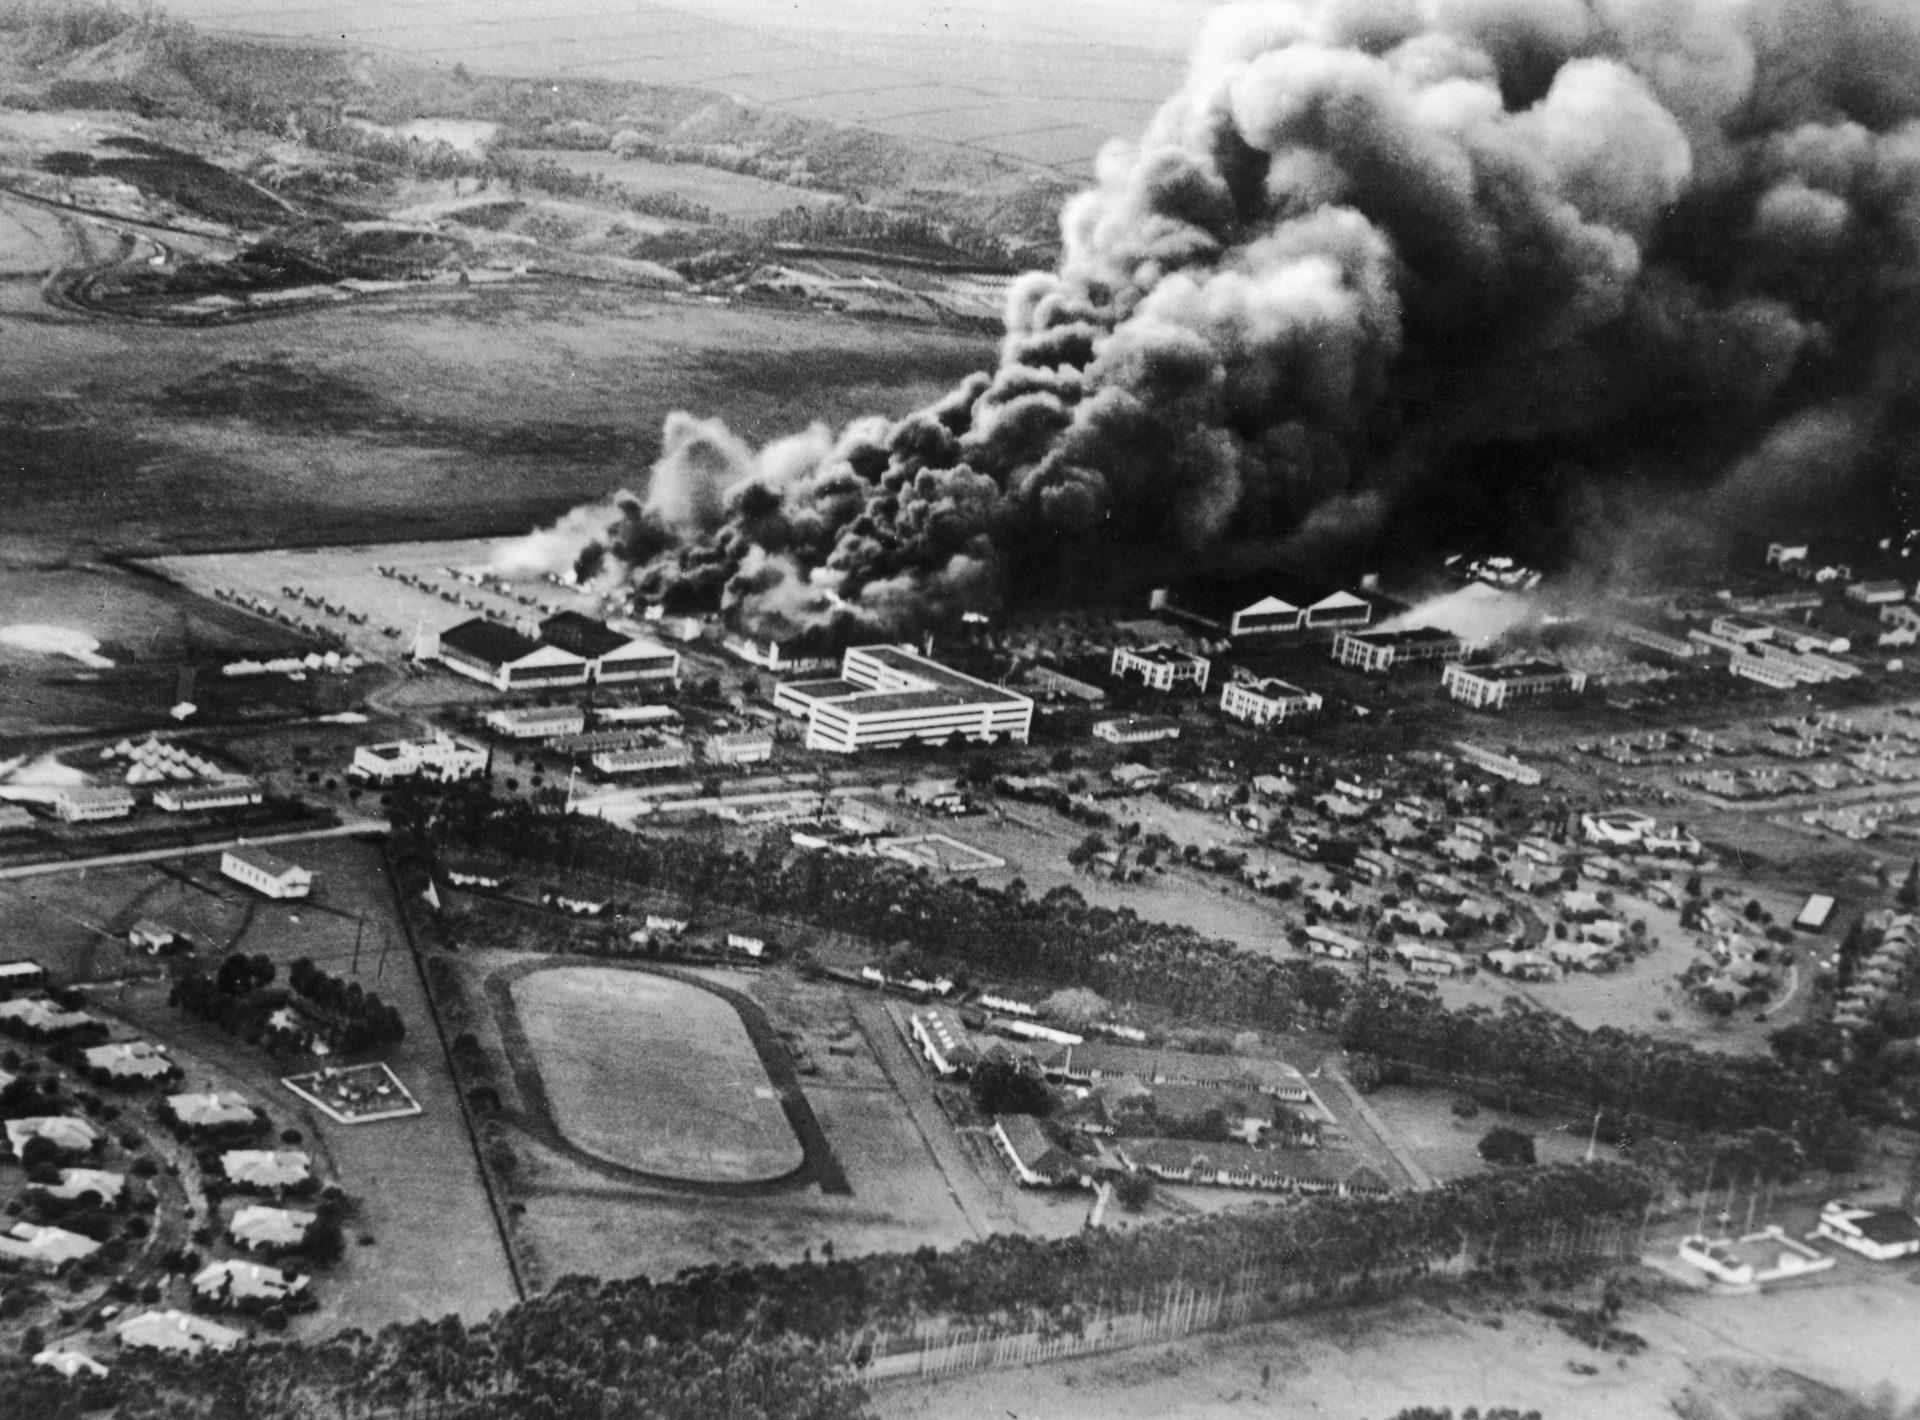 Пожар после налета на Перл-Харбор. 7 декабря 1941 г.